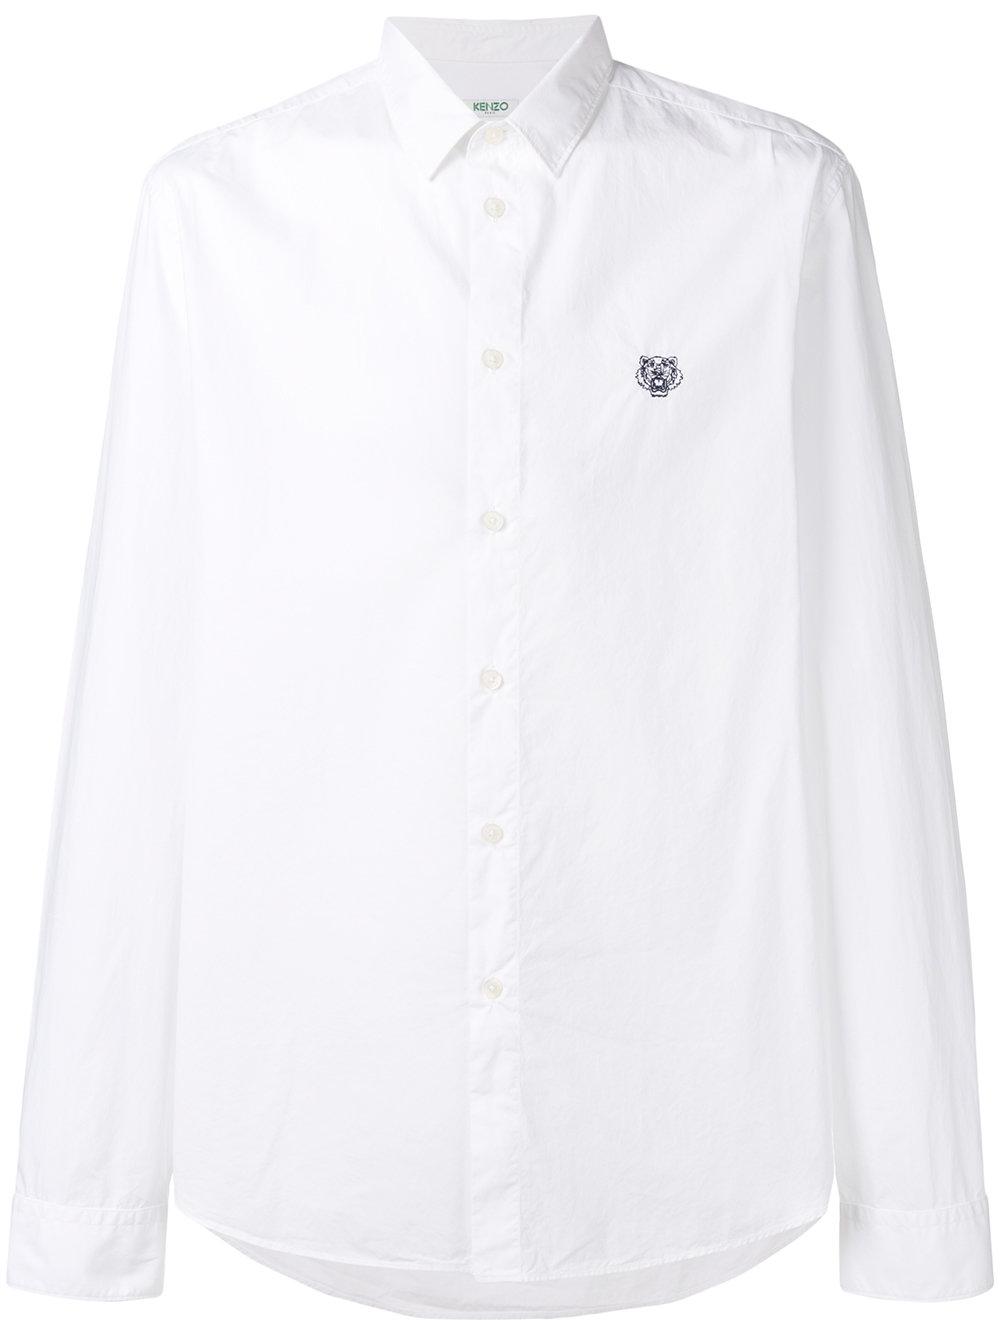 8e3ccbb38d8 ... рубашка с длинными рукавами и логотипом. -18%. Kenzo ...